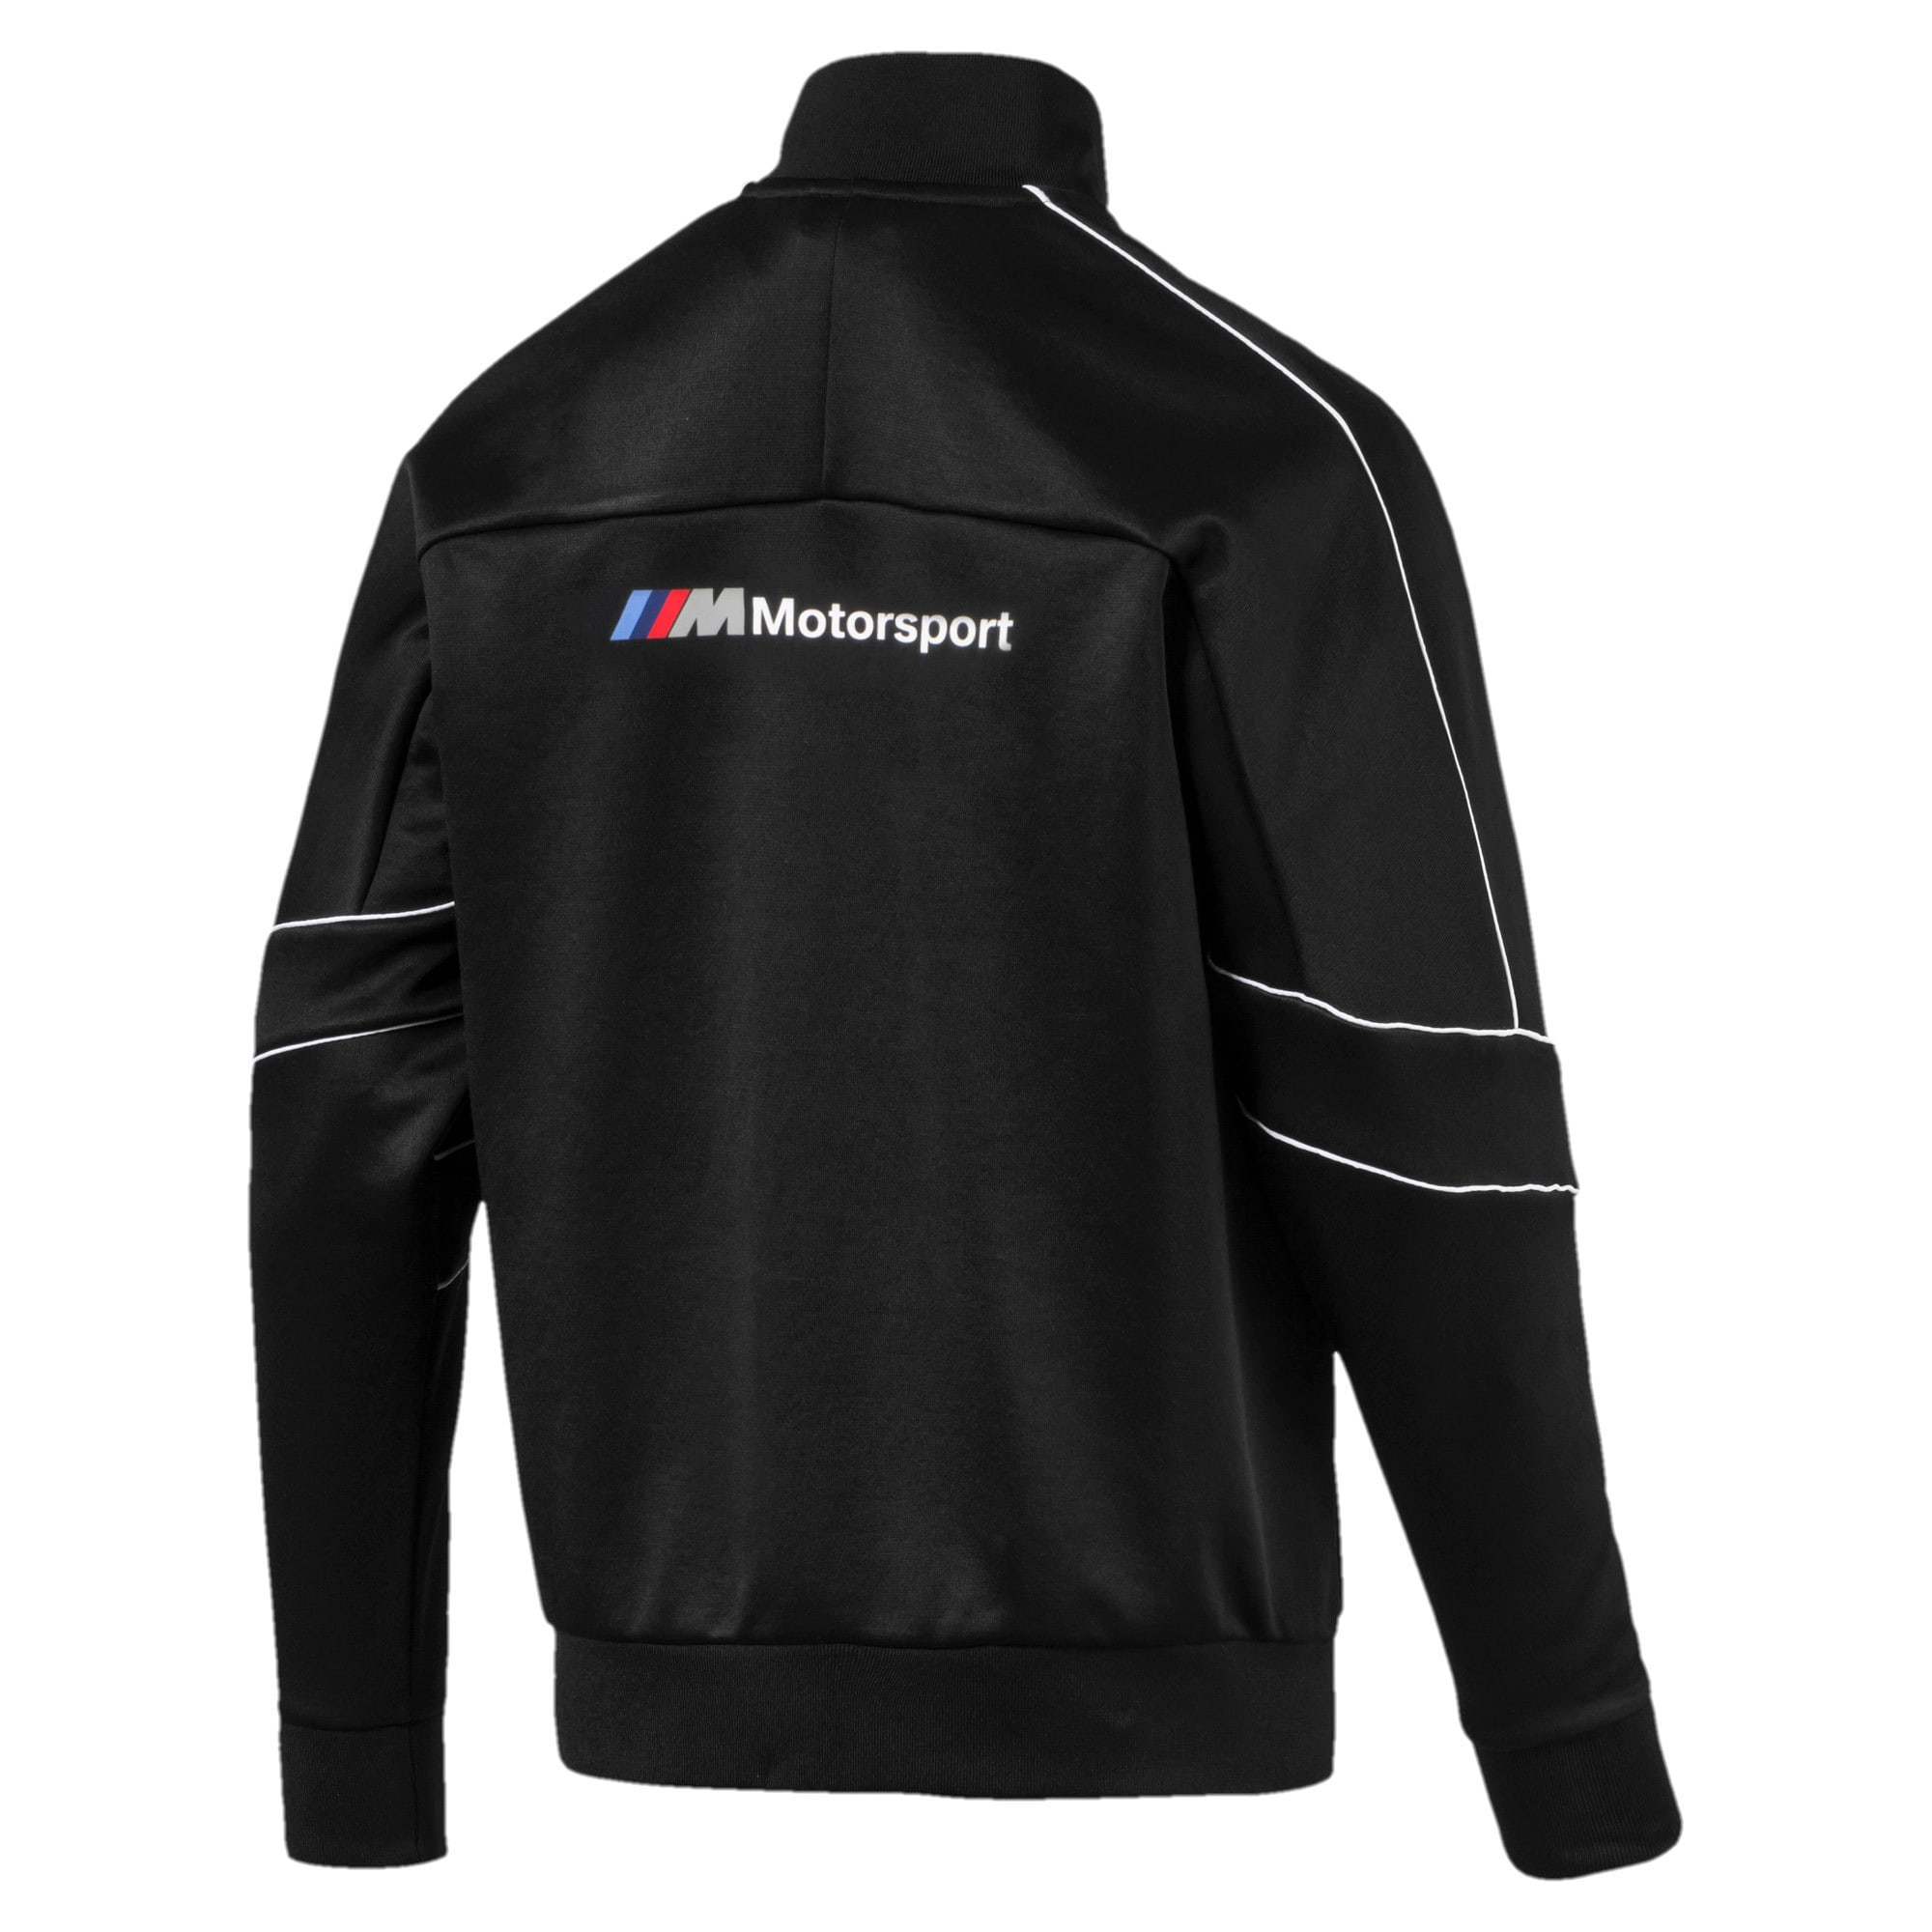 Thumbnail 5 of BMW M Motorsports T7 Track Men's Jacket, Puma Black, medium